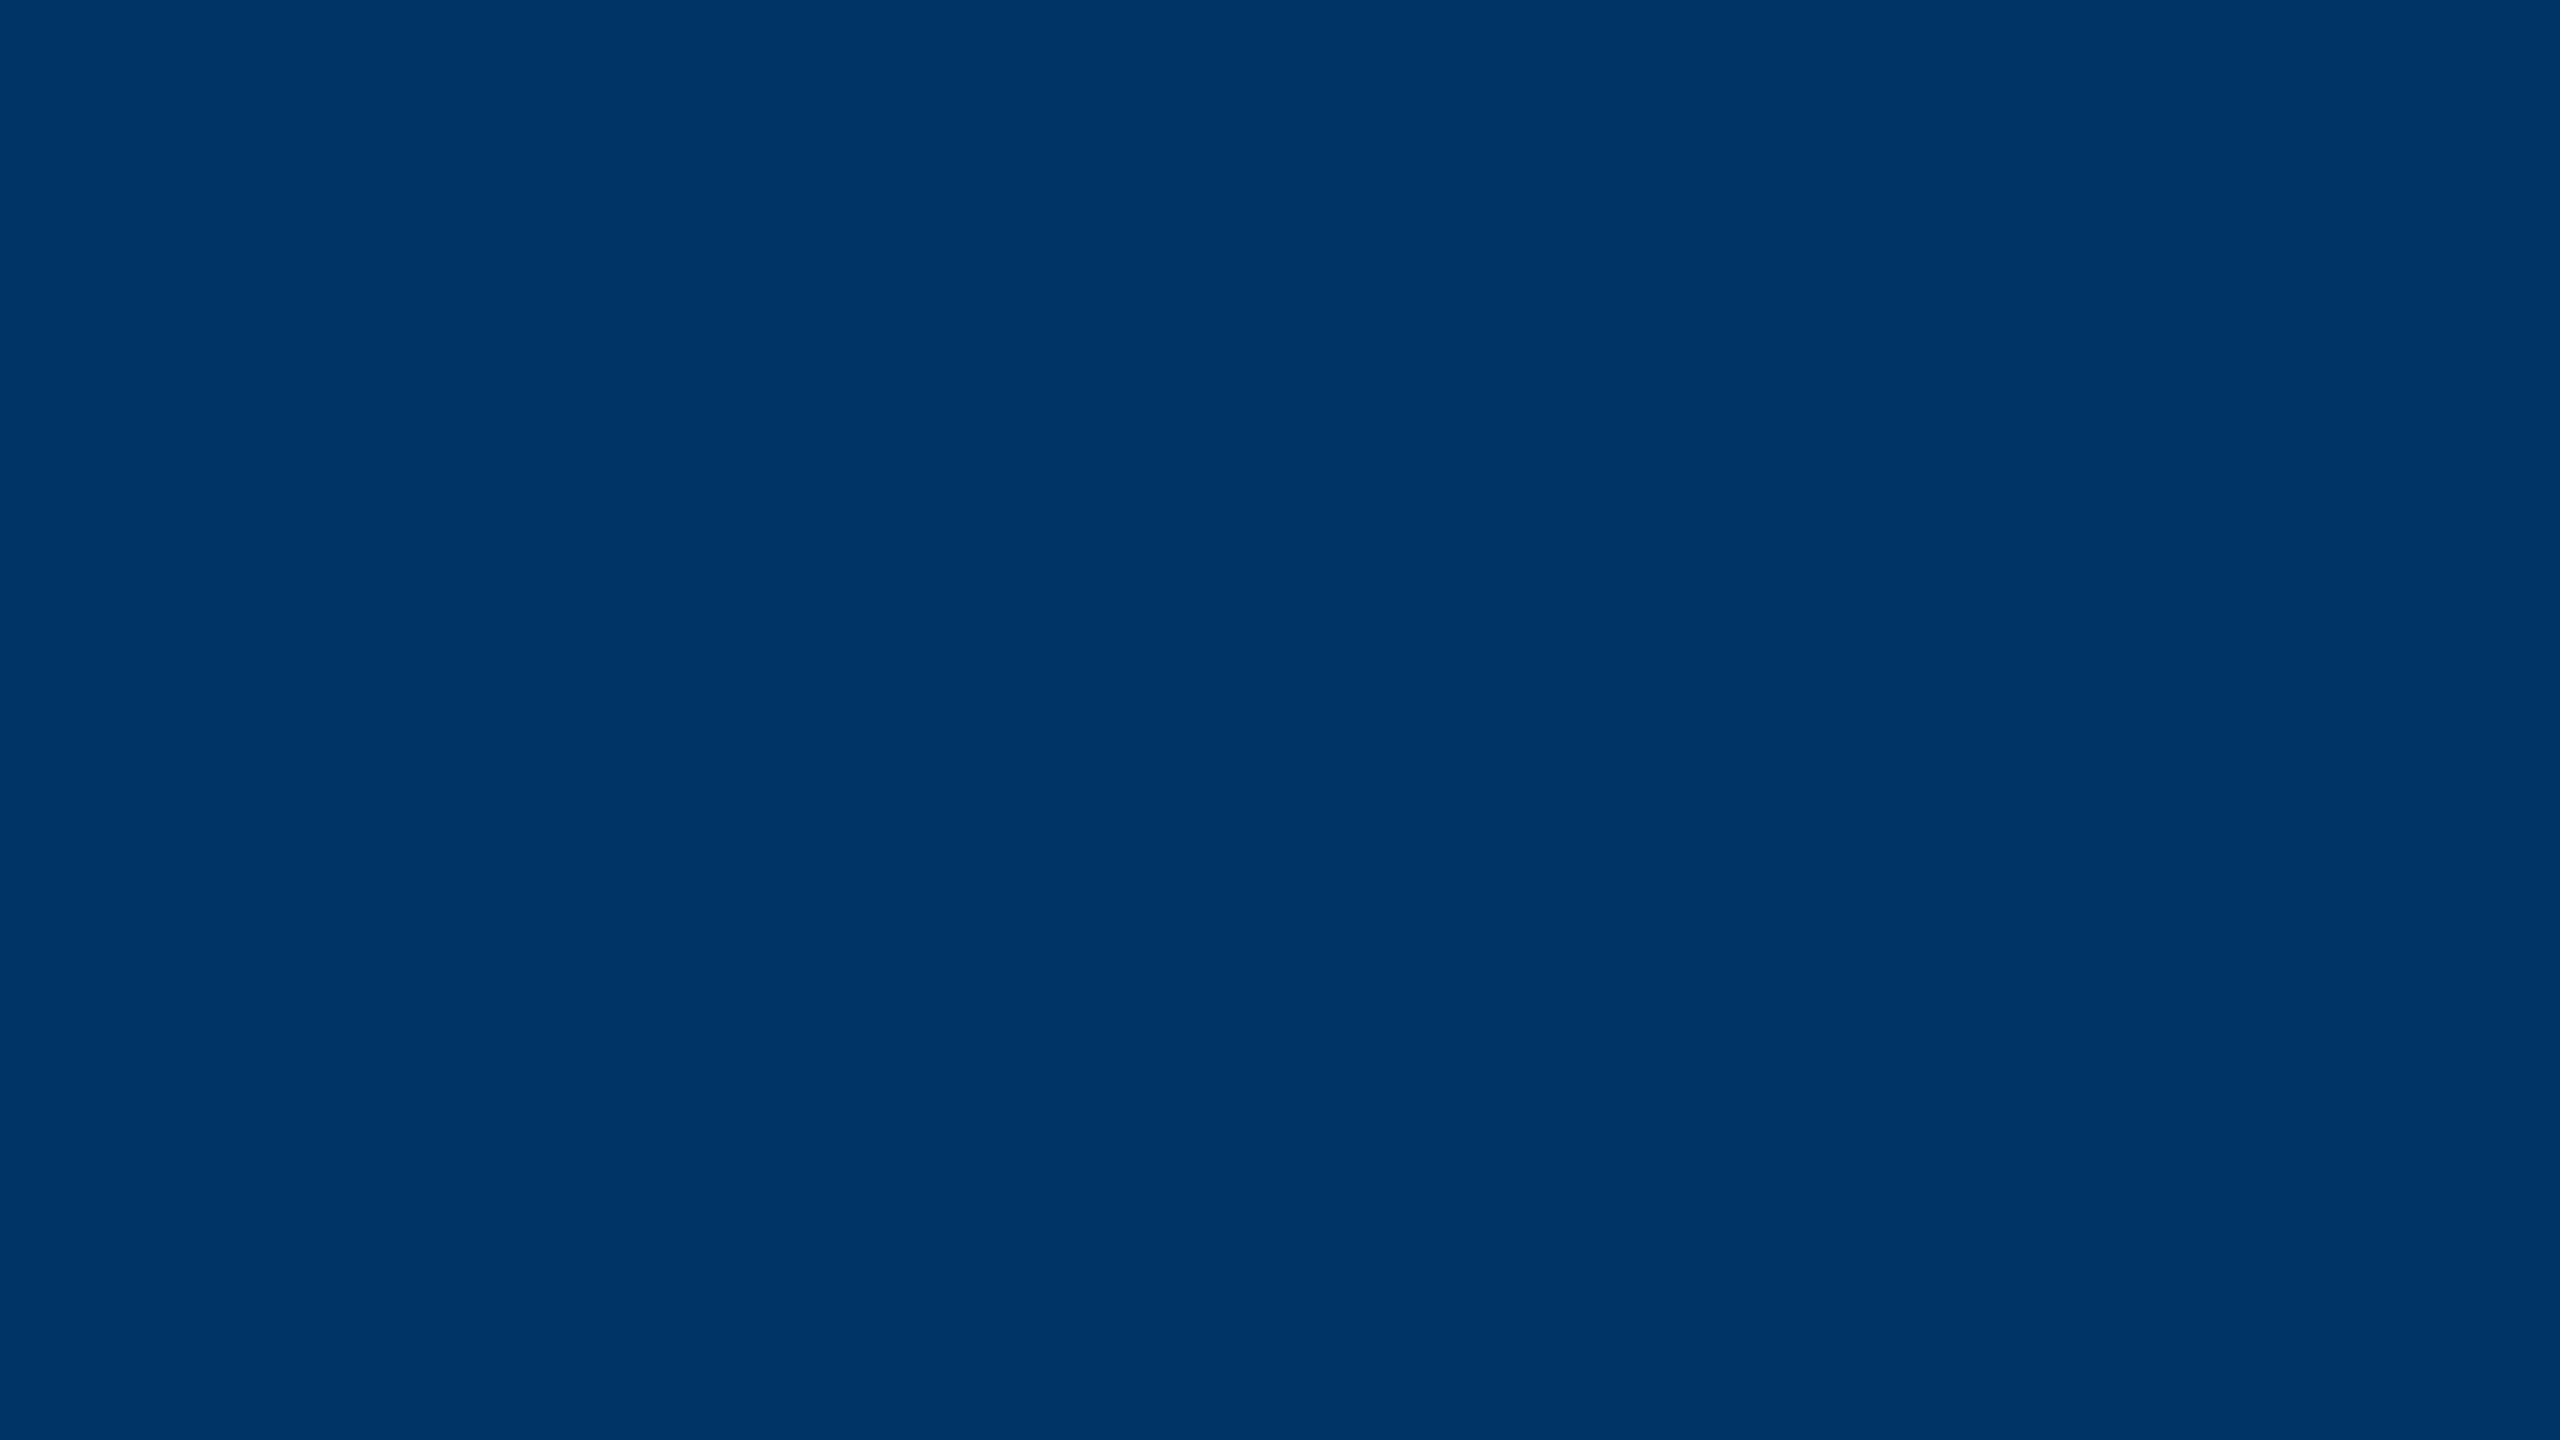 [48+] Blue Color Background Wallpaper on WallpaperSafari